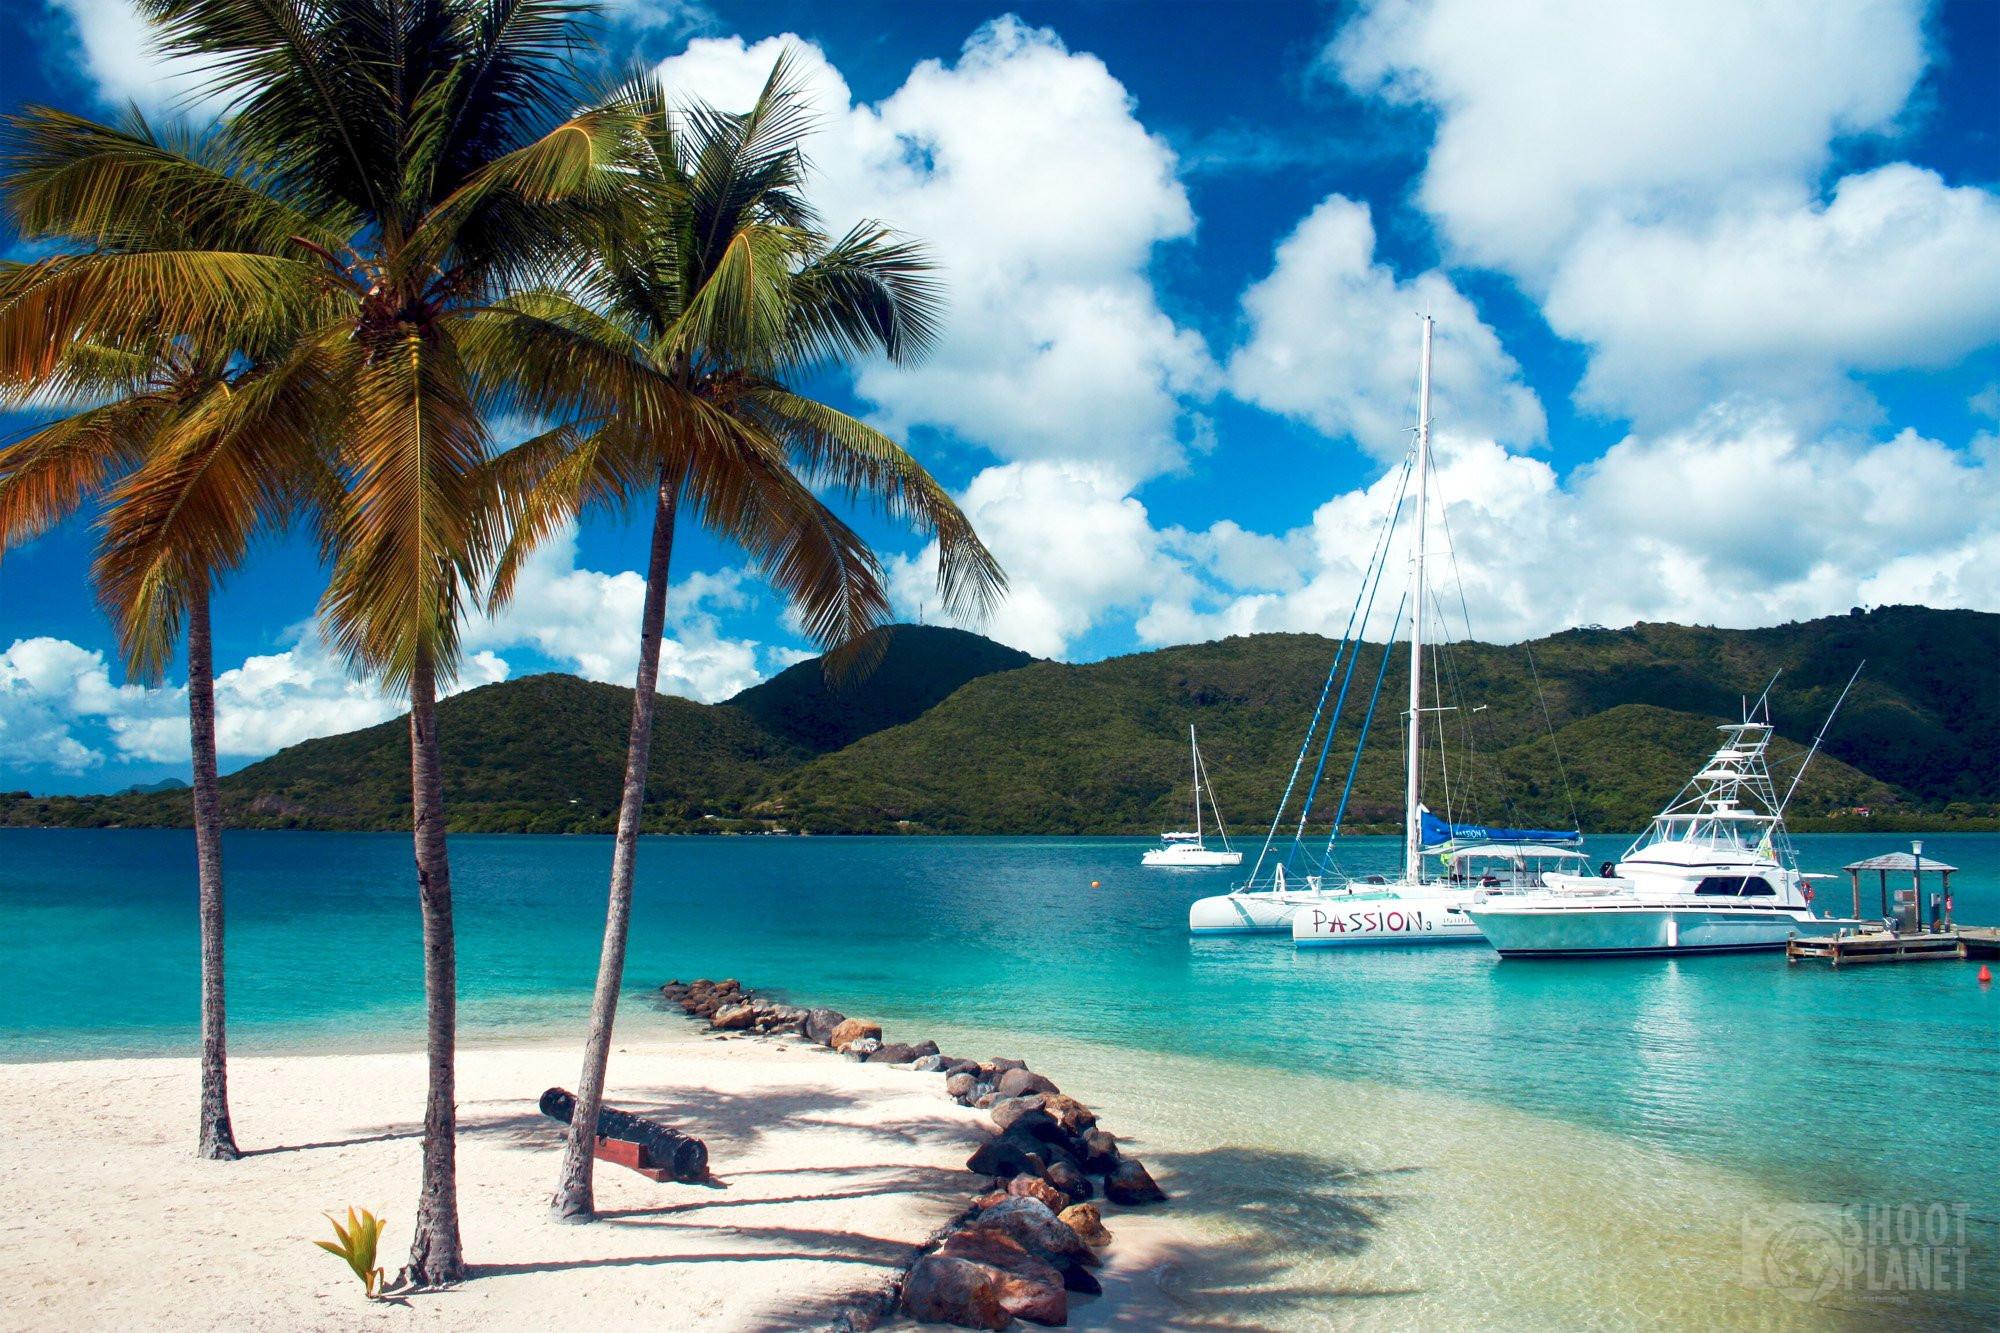 Coconut beach and sailboats, Martinique Caribbean Isl